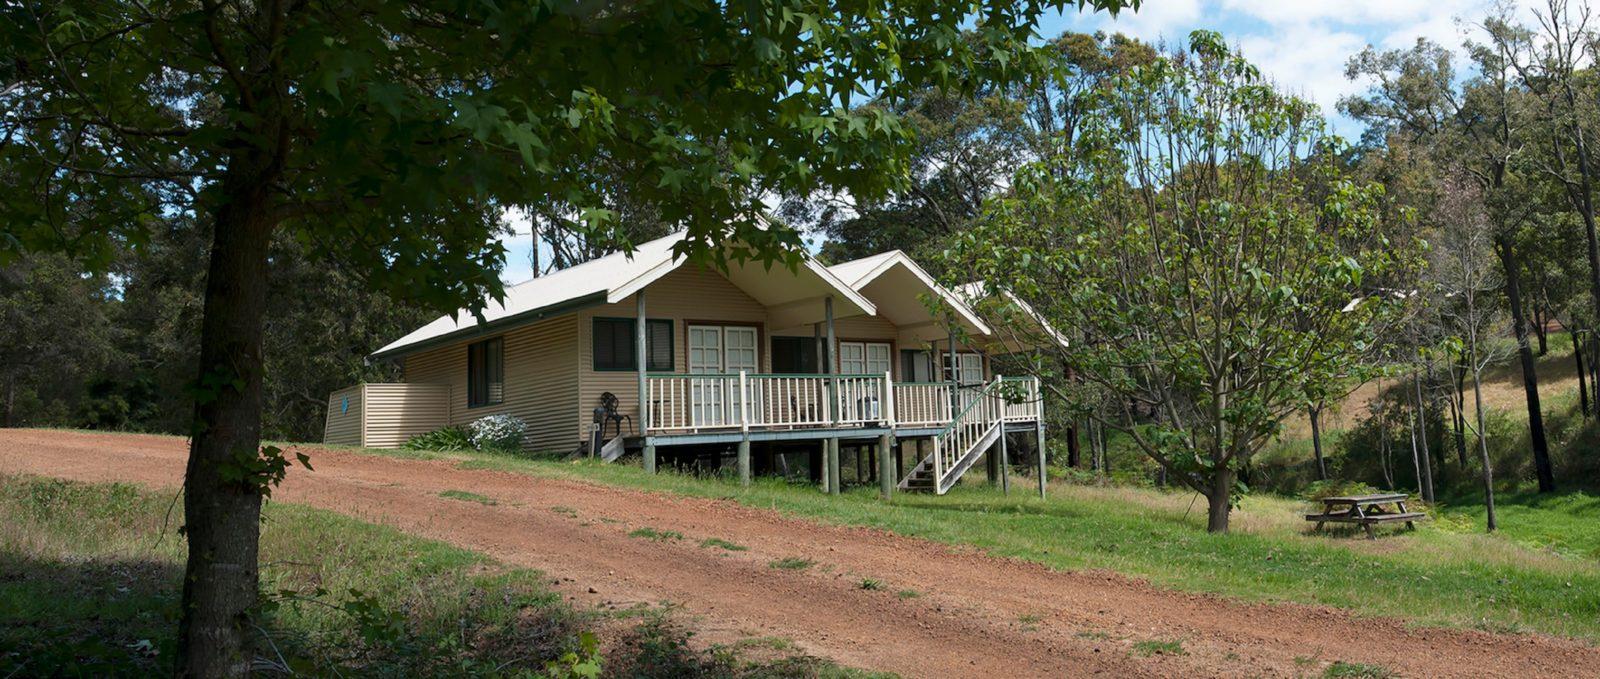 Nannup Valley Retreat, Nannup, Western Australia